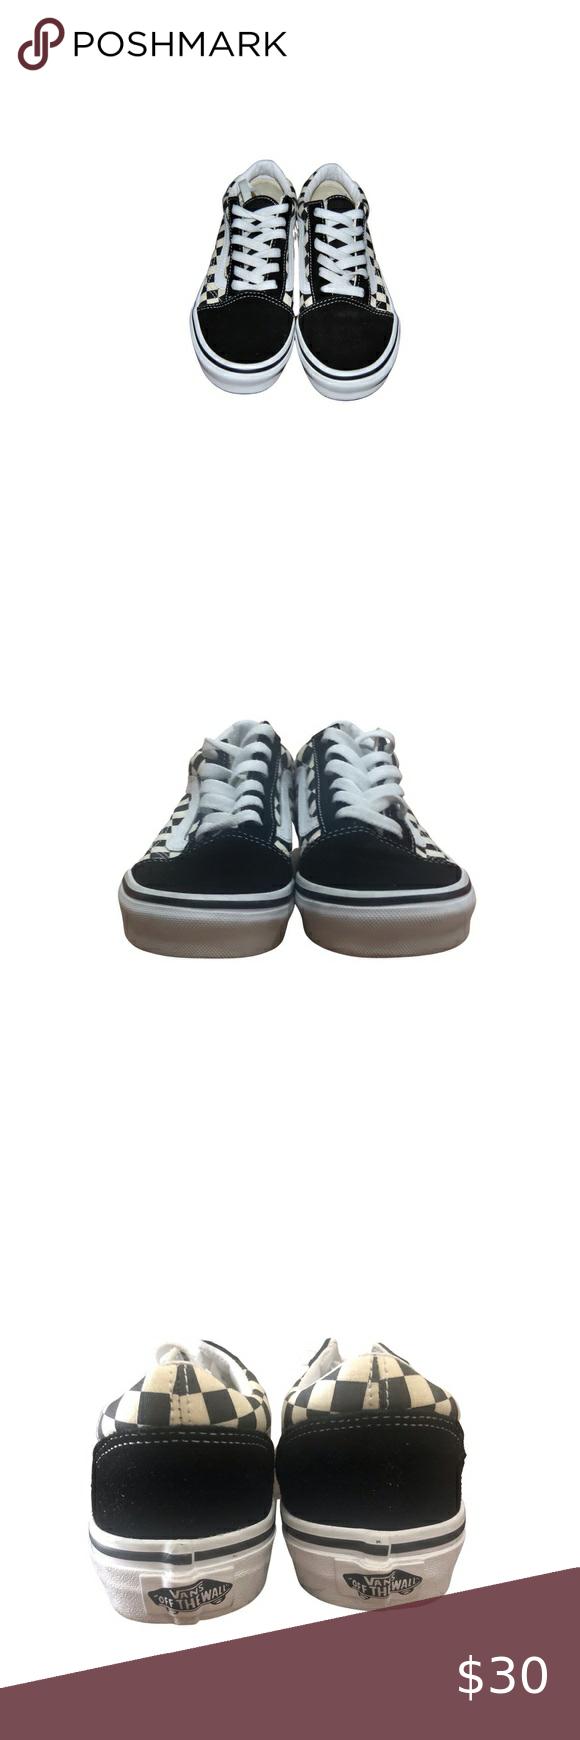 Vans Old Skool Girls Sneakers Spotted while shoppi